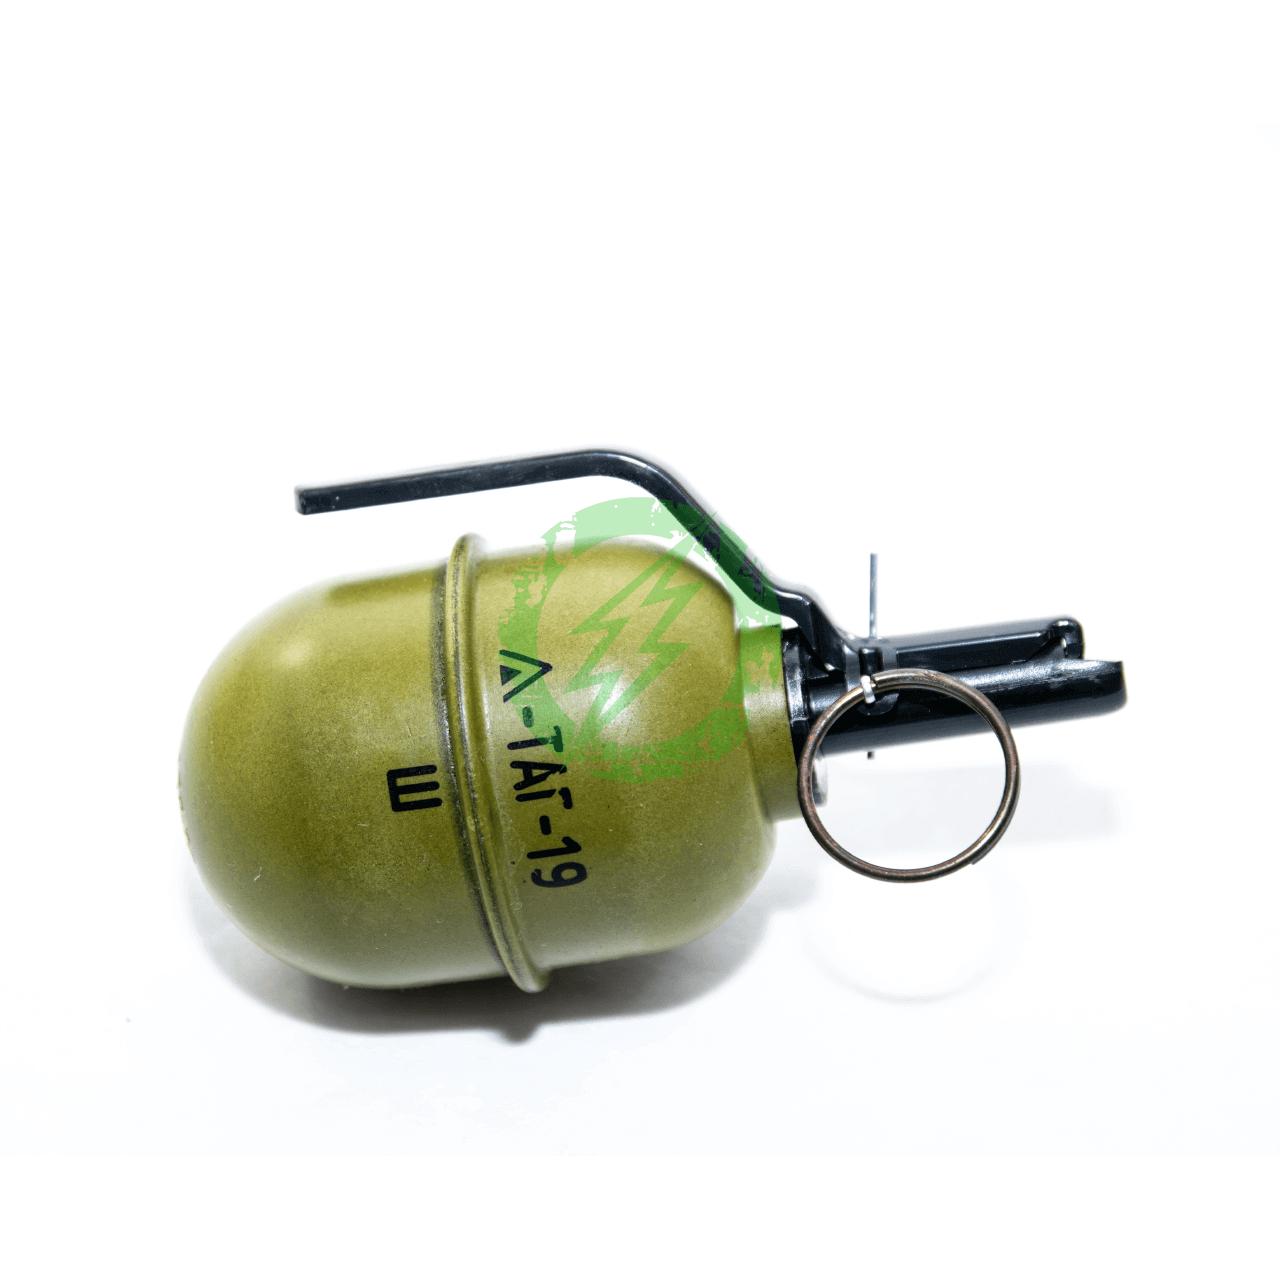 Pyro Shipped Easy TAGinn AG-19 Airsoft Hand Grenade | Single